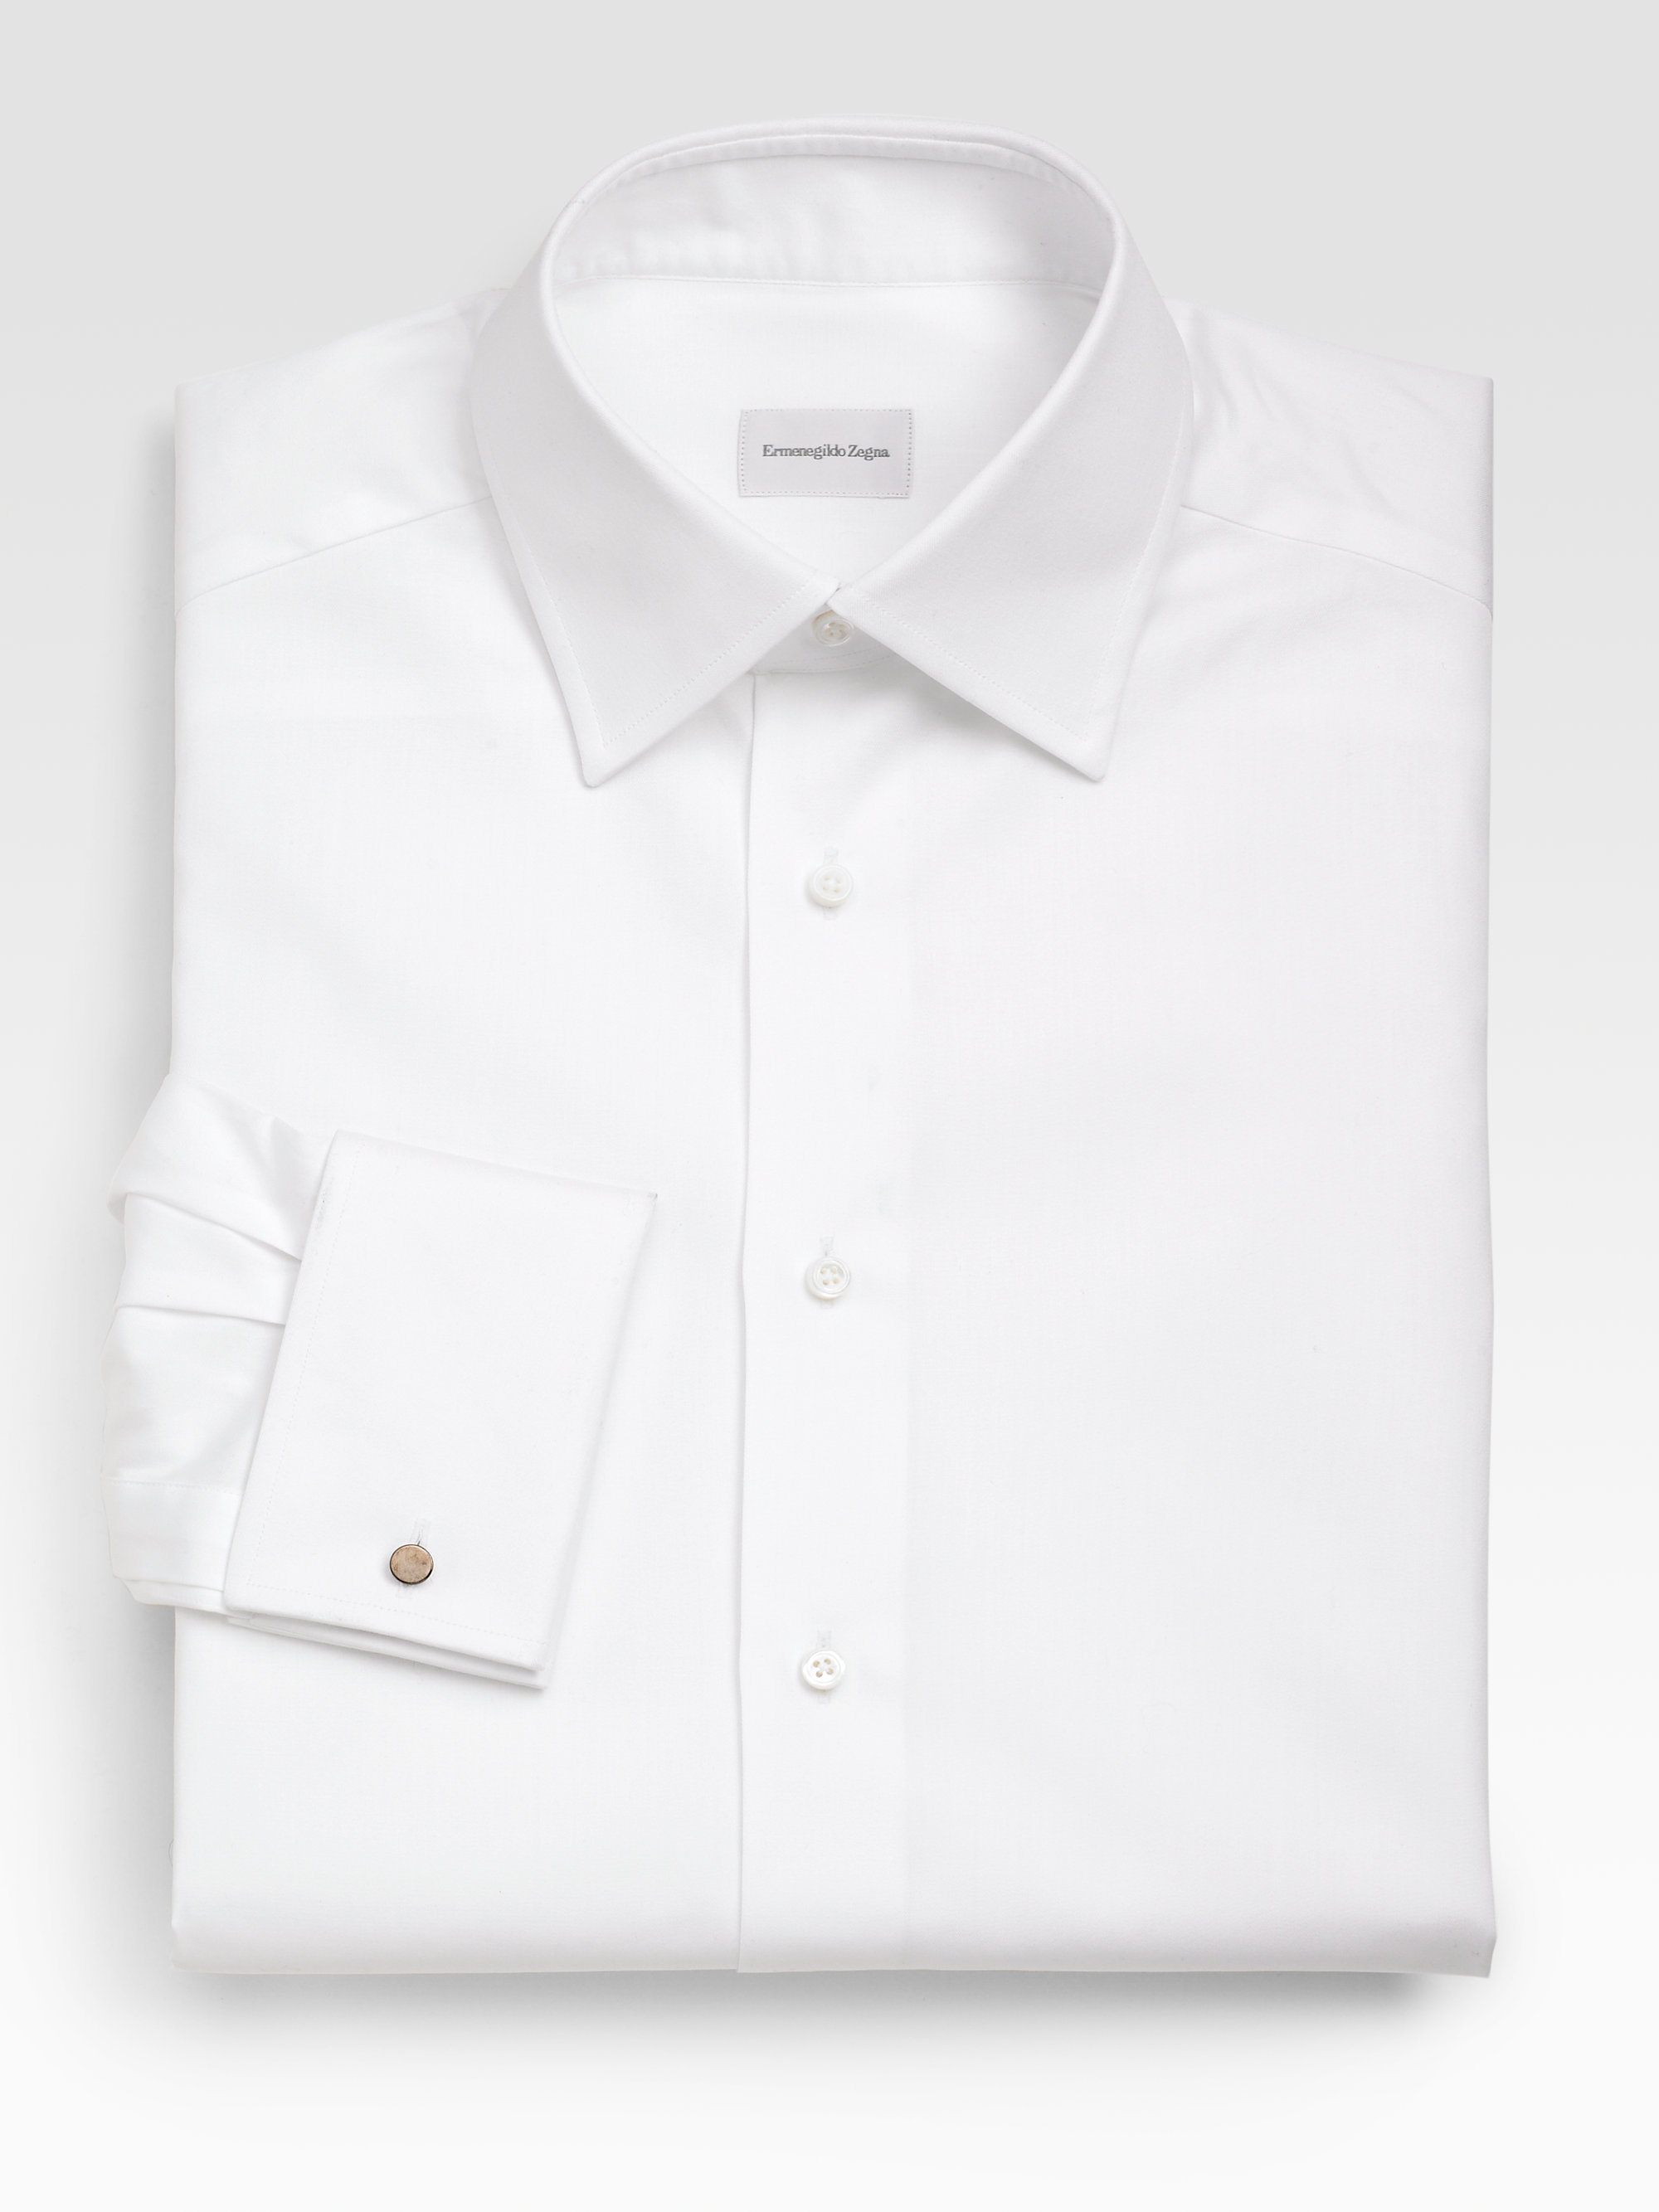 Lyst Ermenegildo Zegna French Cuff Dress Shirt In White For Men